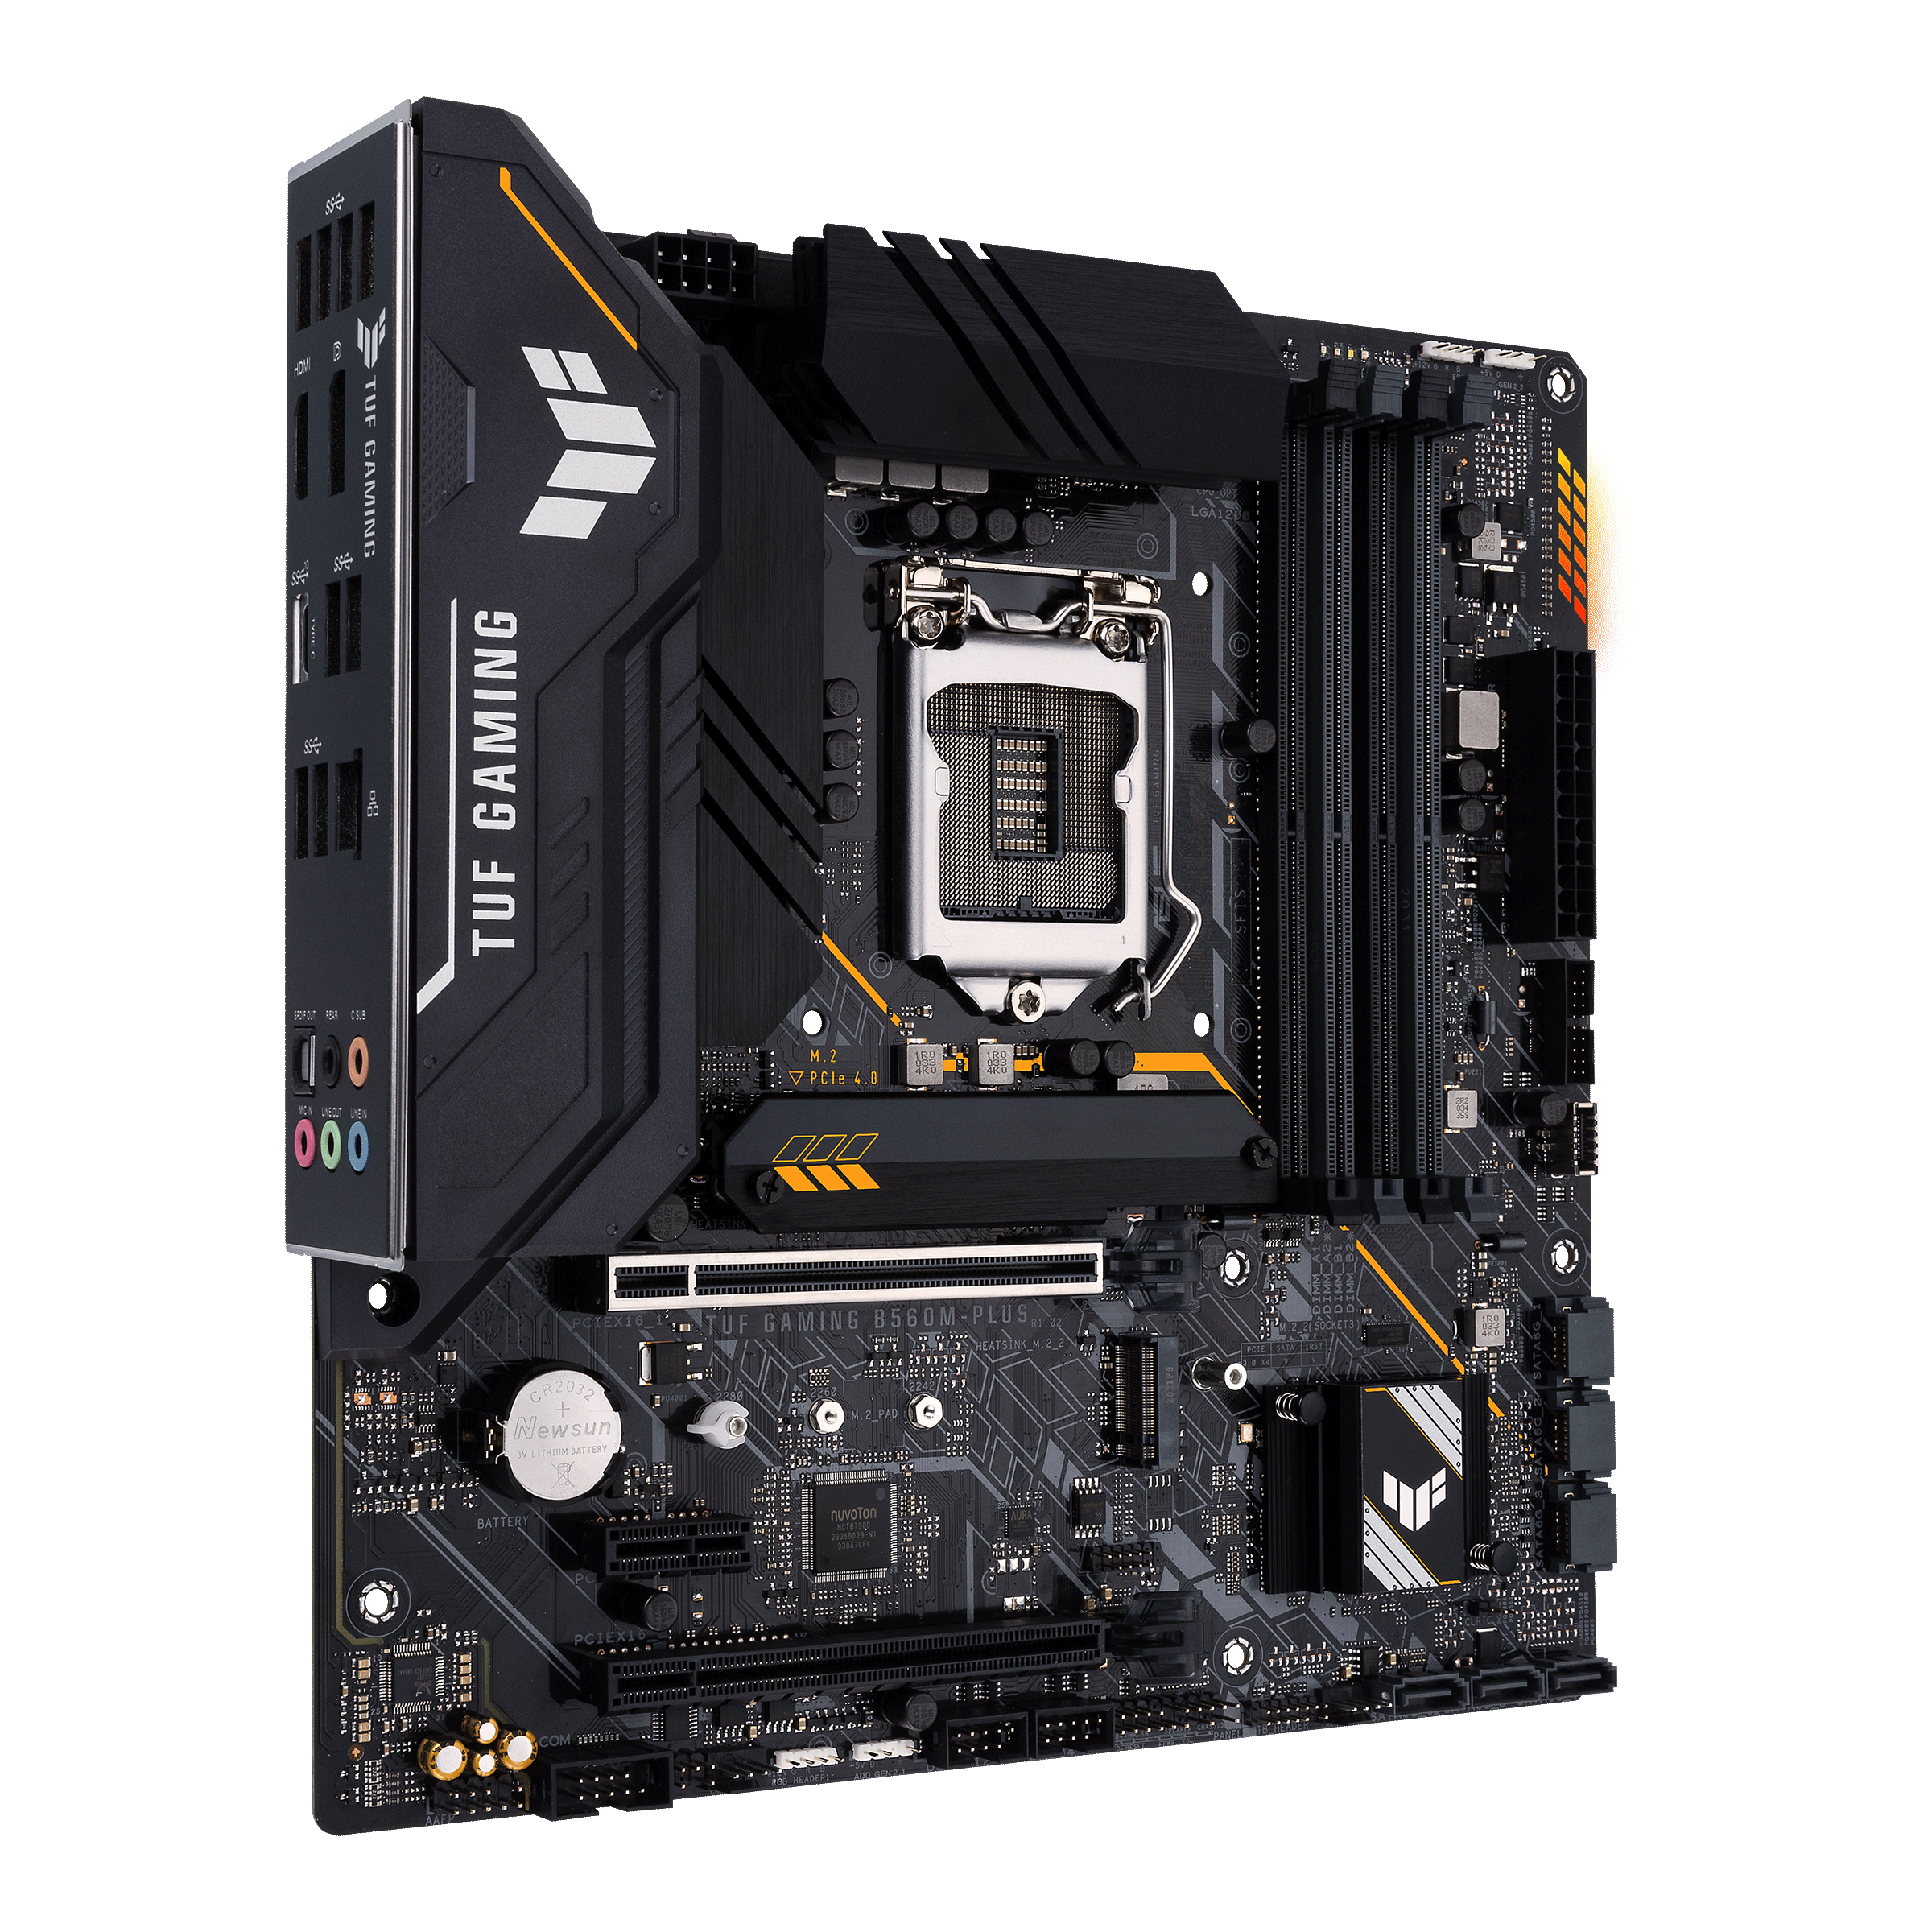 ASUS TUF GAMING B560M-PLUS - Motherboard - ATX - LGA1200-Sockel - B560 - USB-C Gen1, USB 3.2 Gen 1, USB 3.2 Gen 2 - 2.5 Gigabit LAN - Onboard-Grafik (CPU erforderlich)